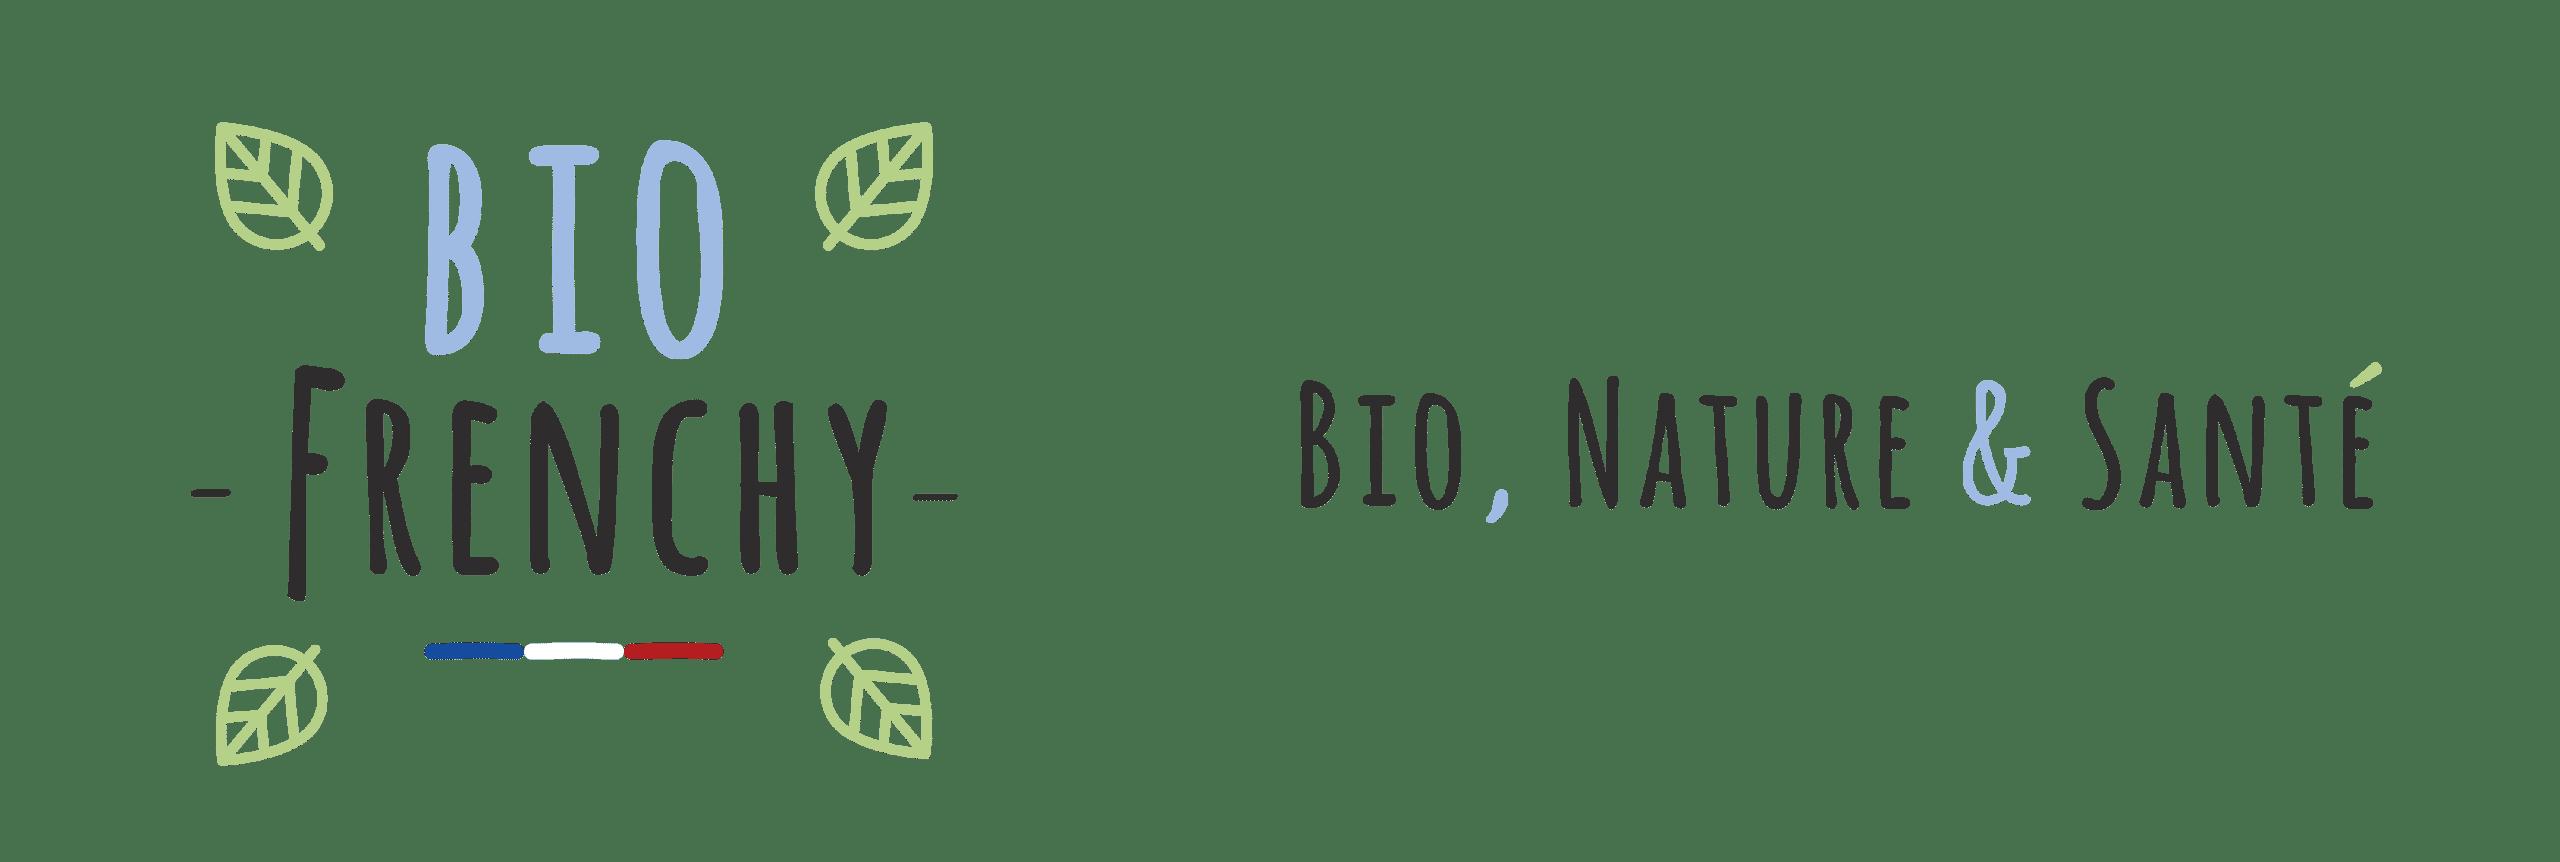 Biofrenchy